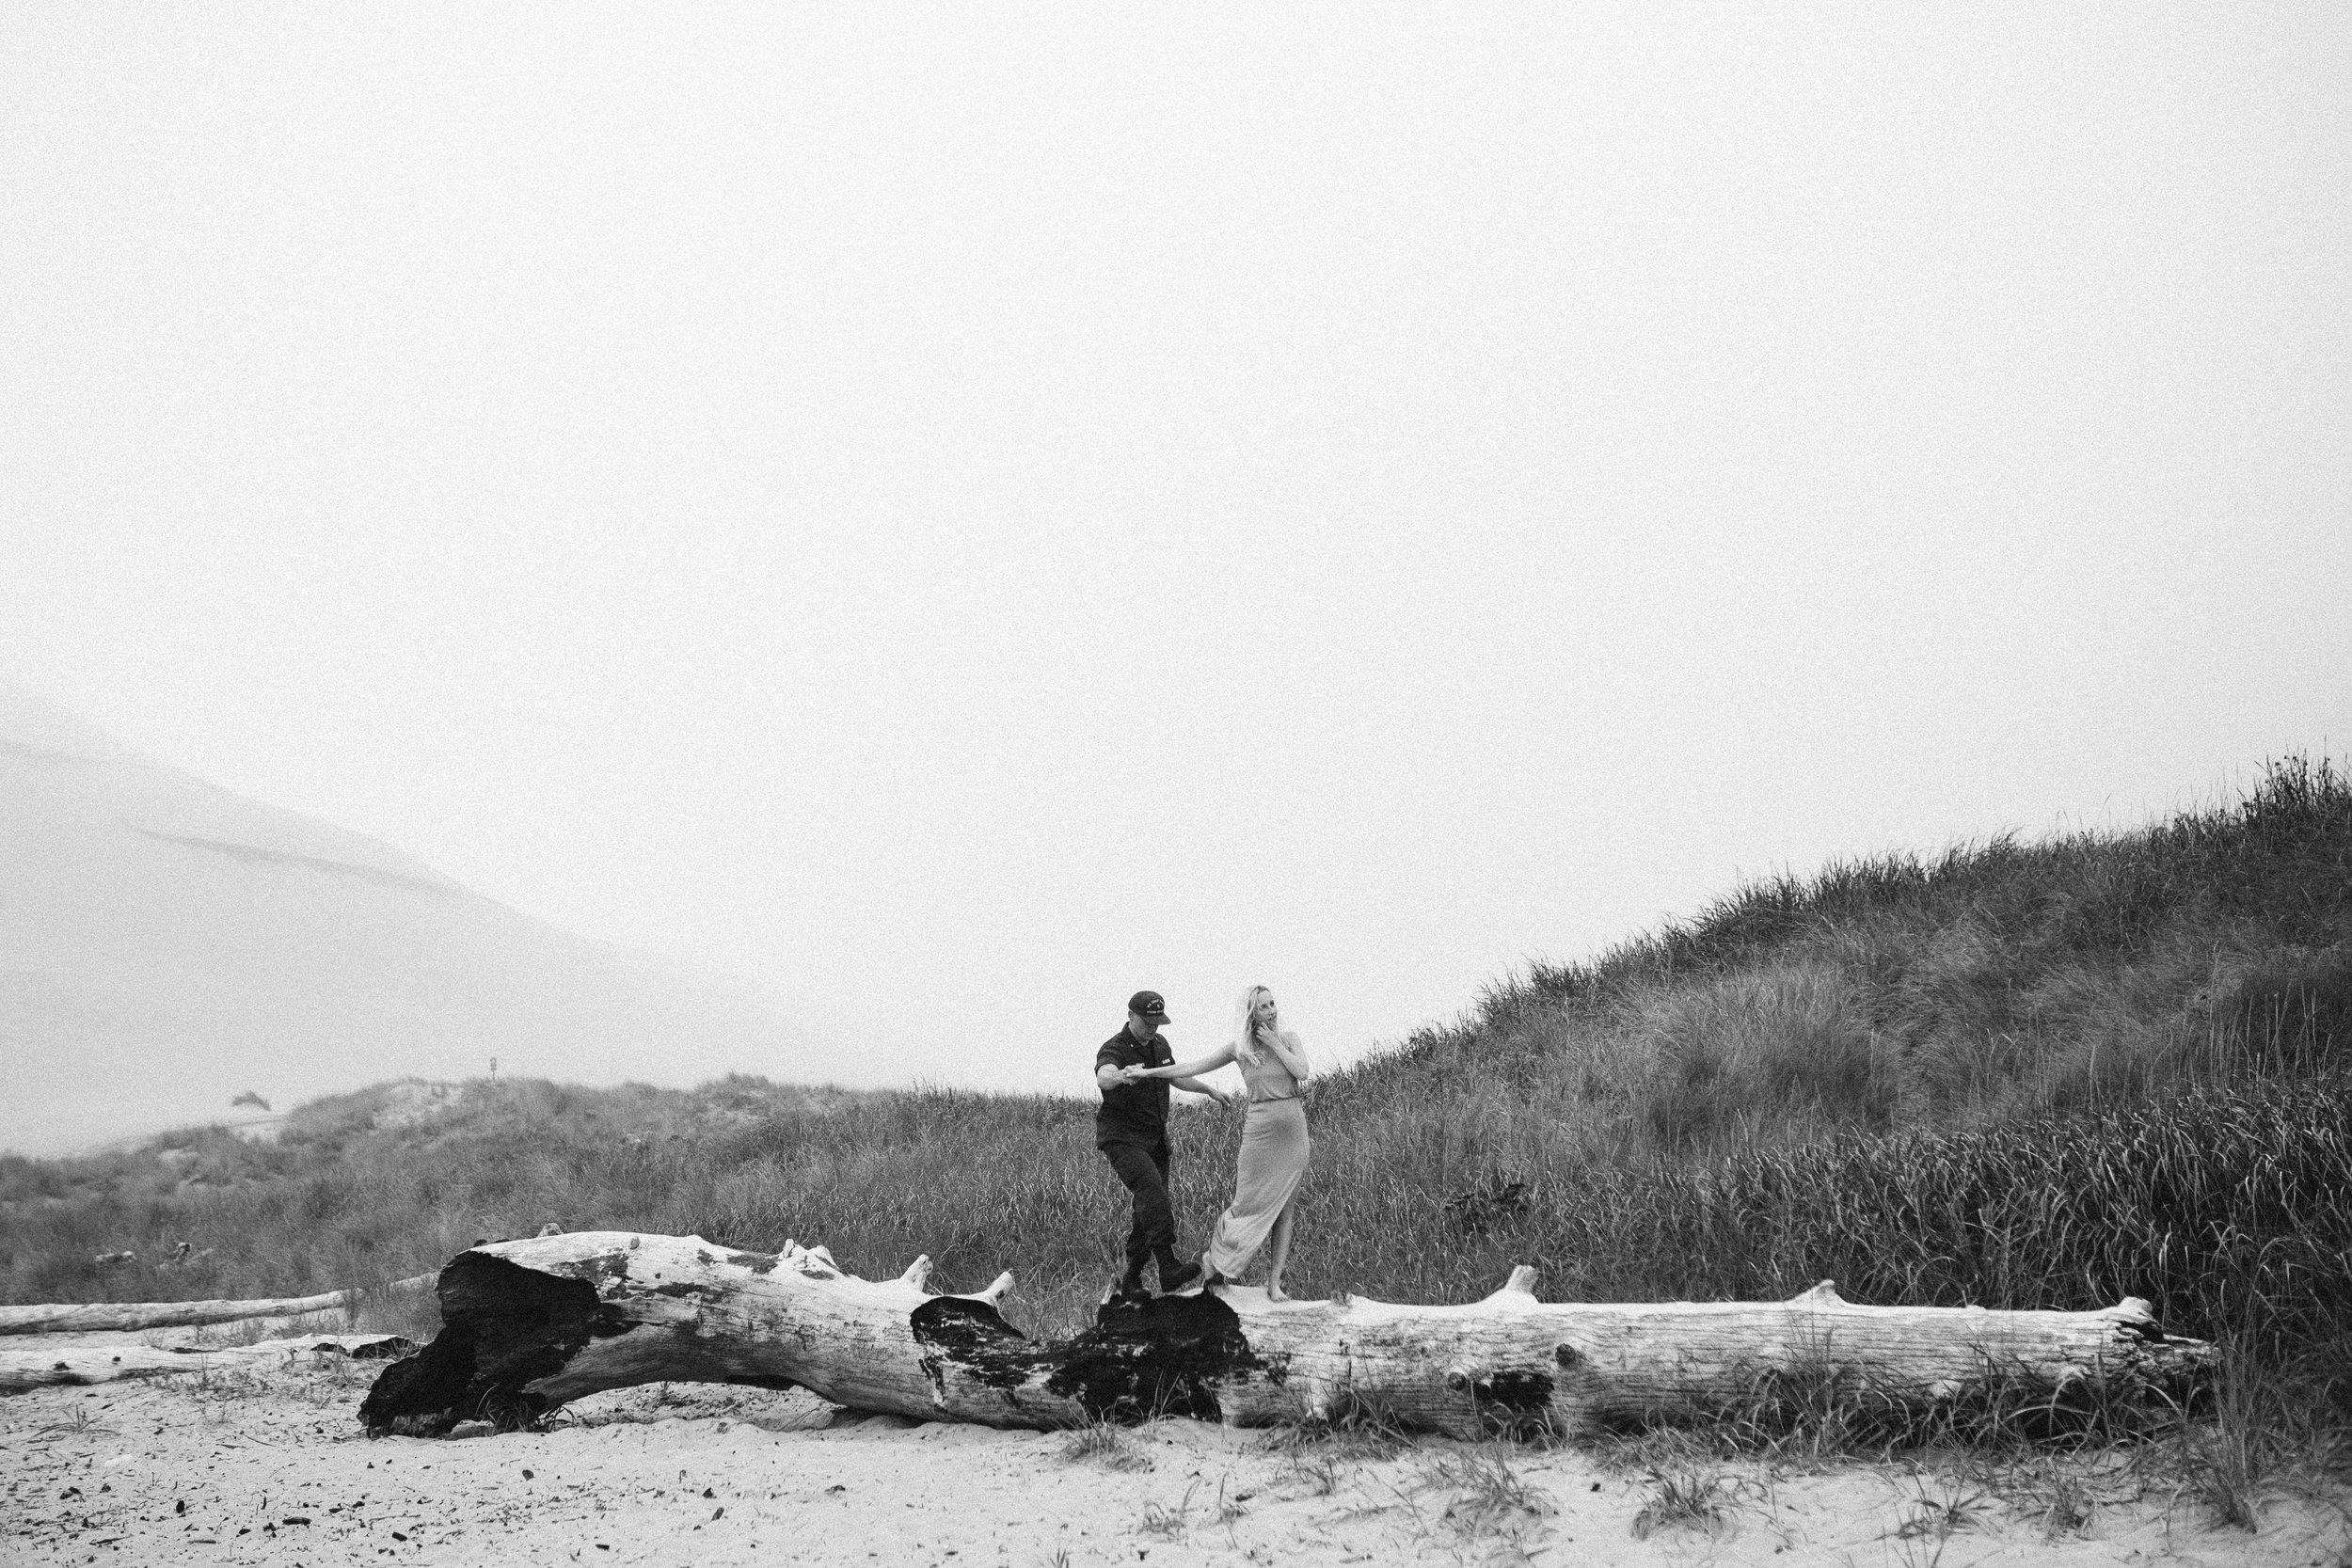 Nicole-daacke-photography-cape-kiwanda-foggy-adventure-session-engagement-session-anniversary-photos-oregon-coast-pacific-city-oregon-elopement-photographer-7.jpg